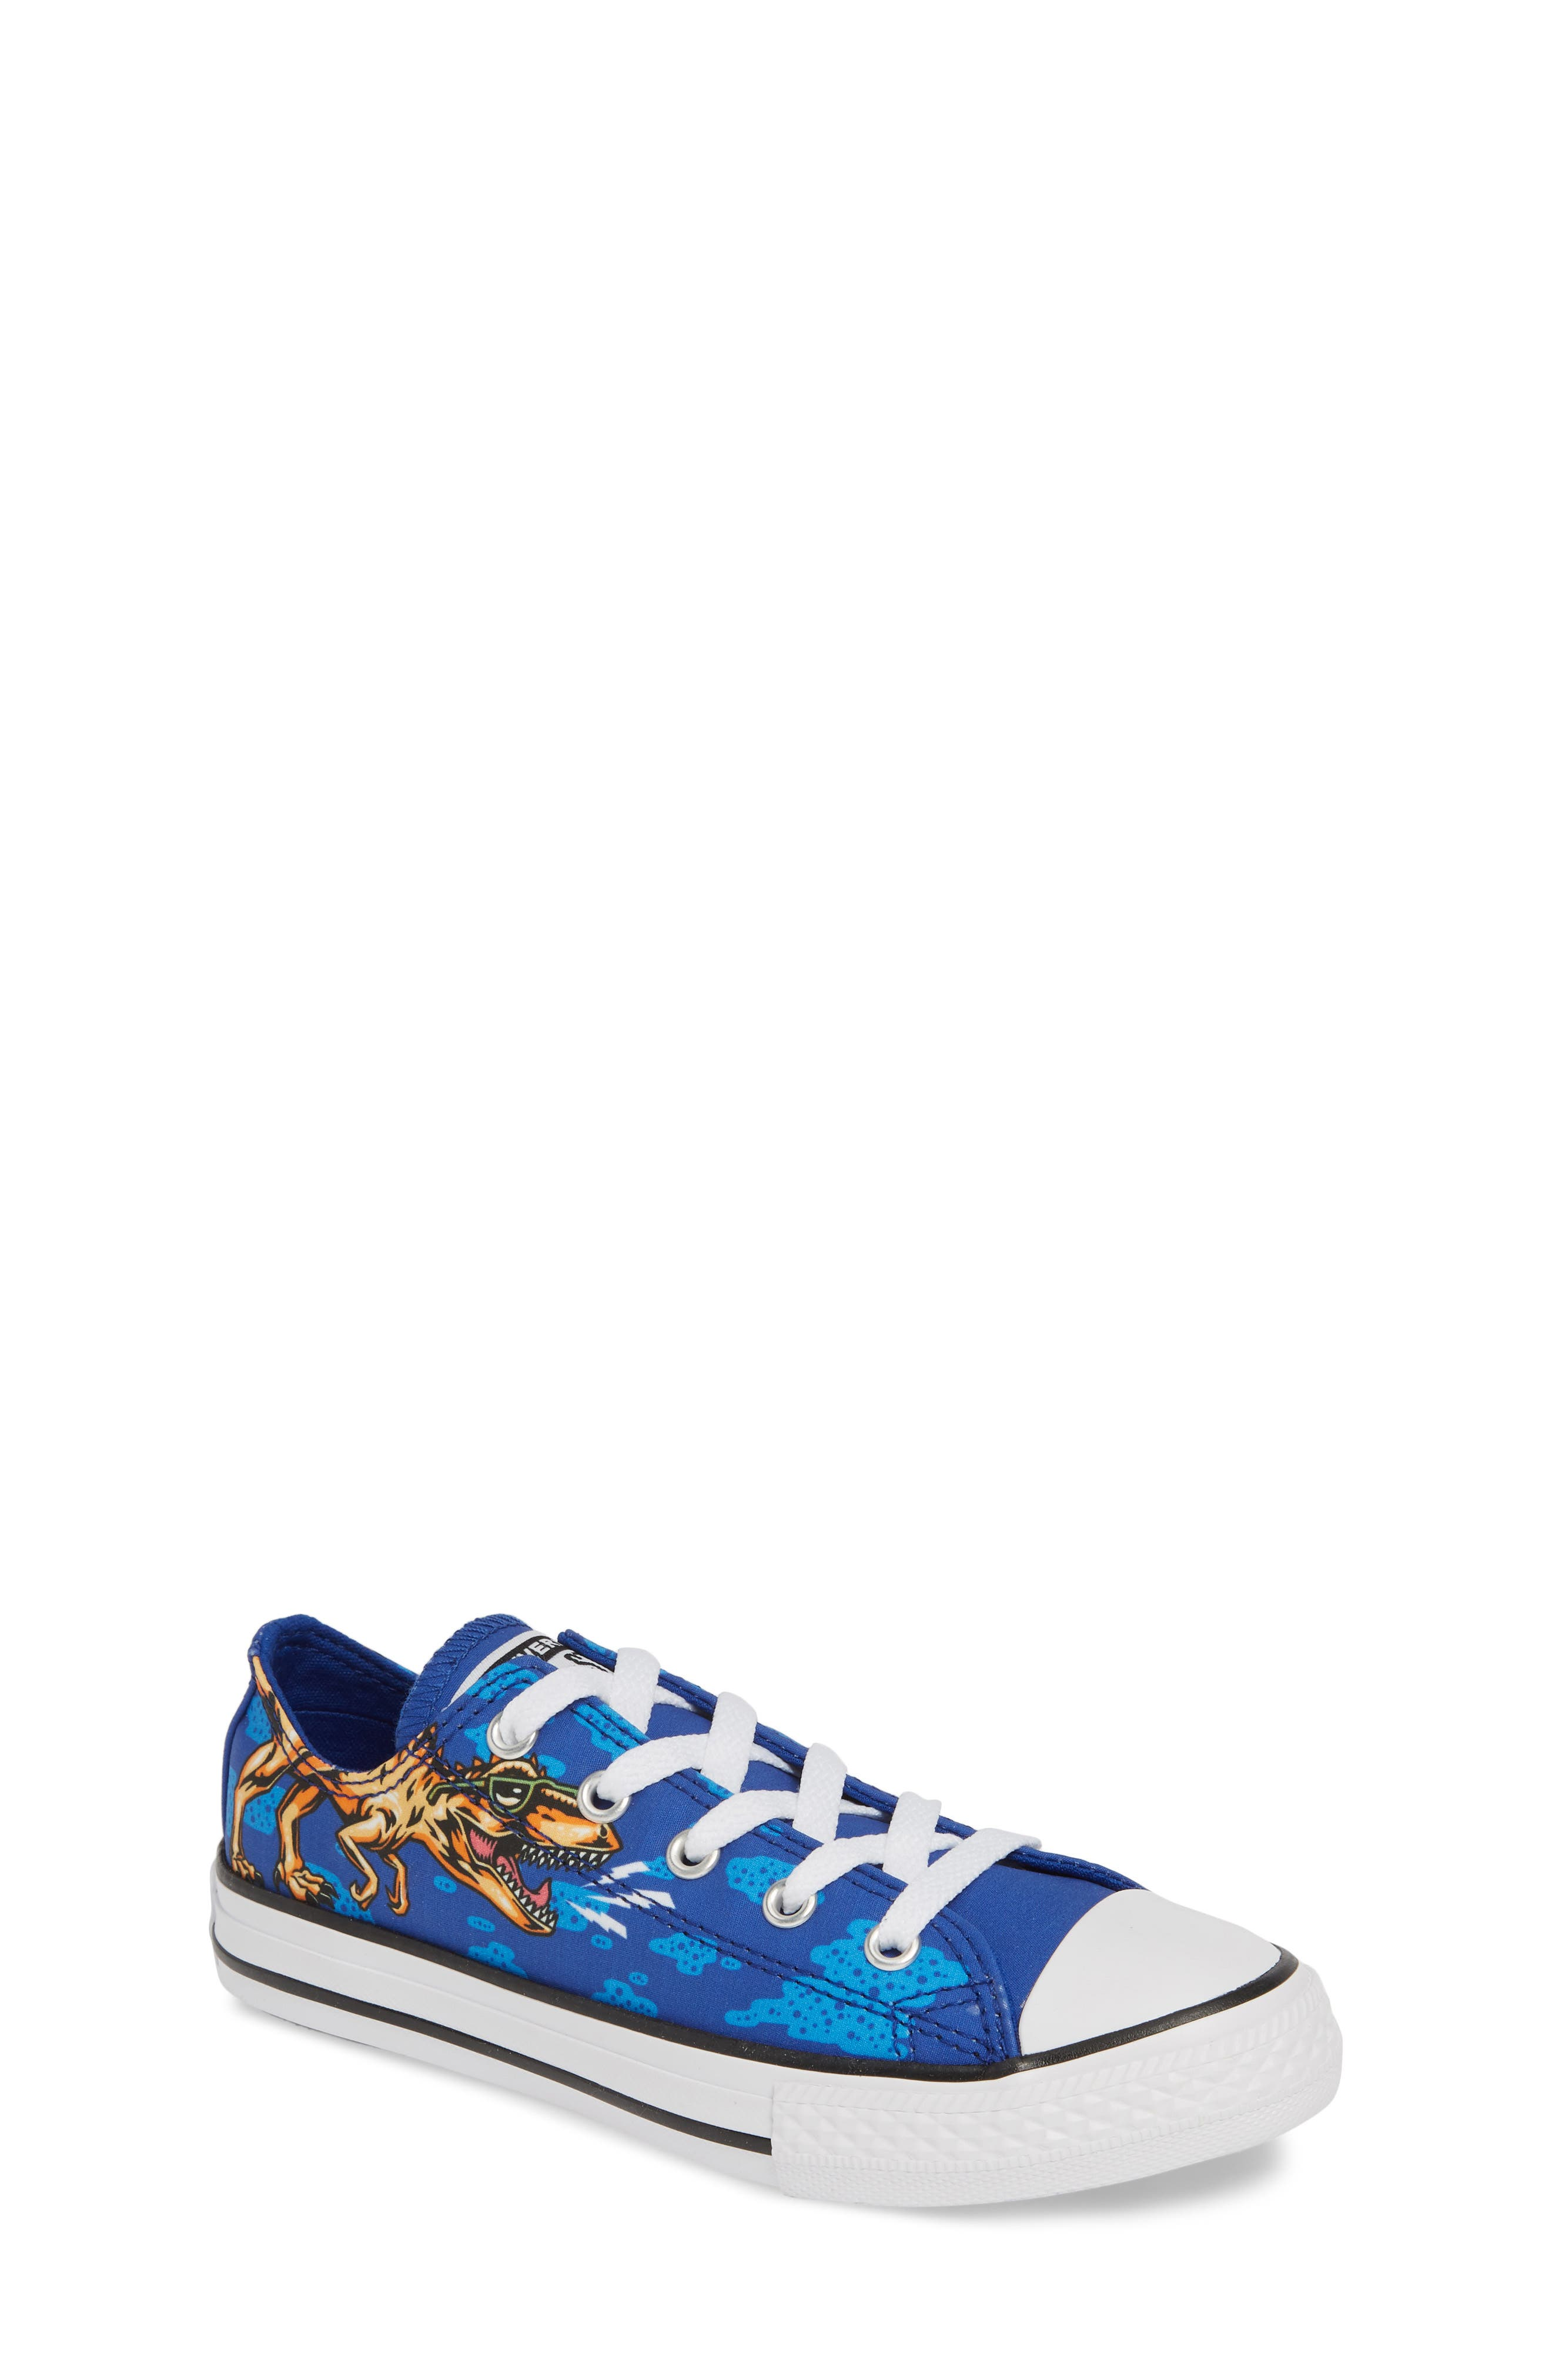 Converse Chuck Taylor All Star Dino Sneaker